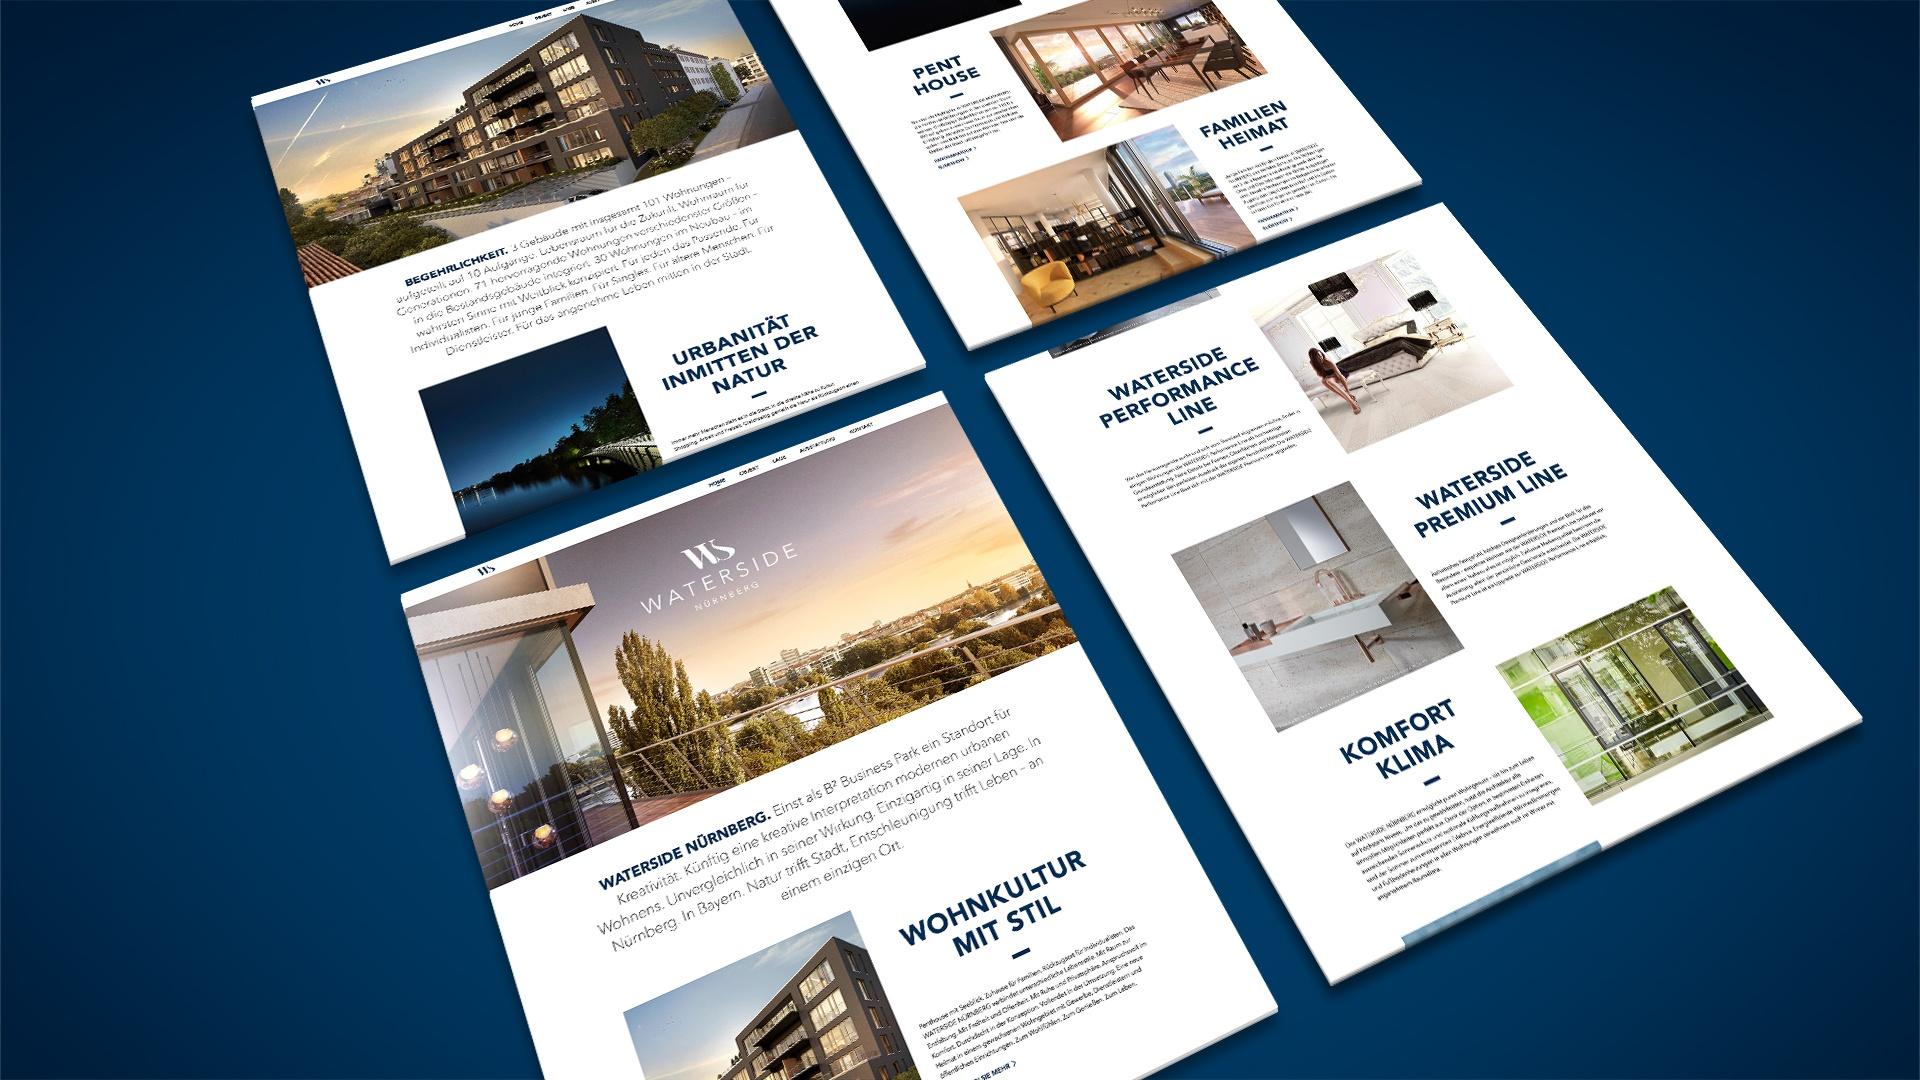 Immobilienprojekt Waterside Nürnberg